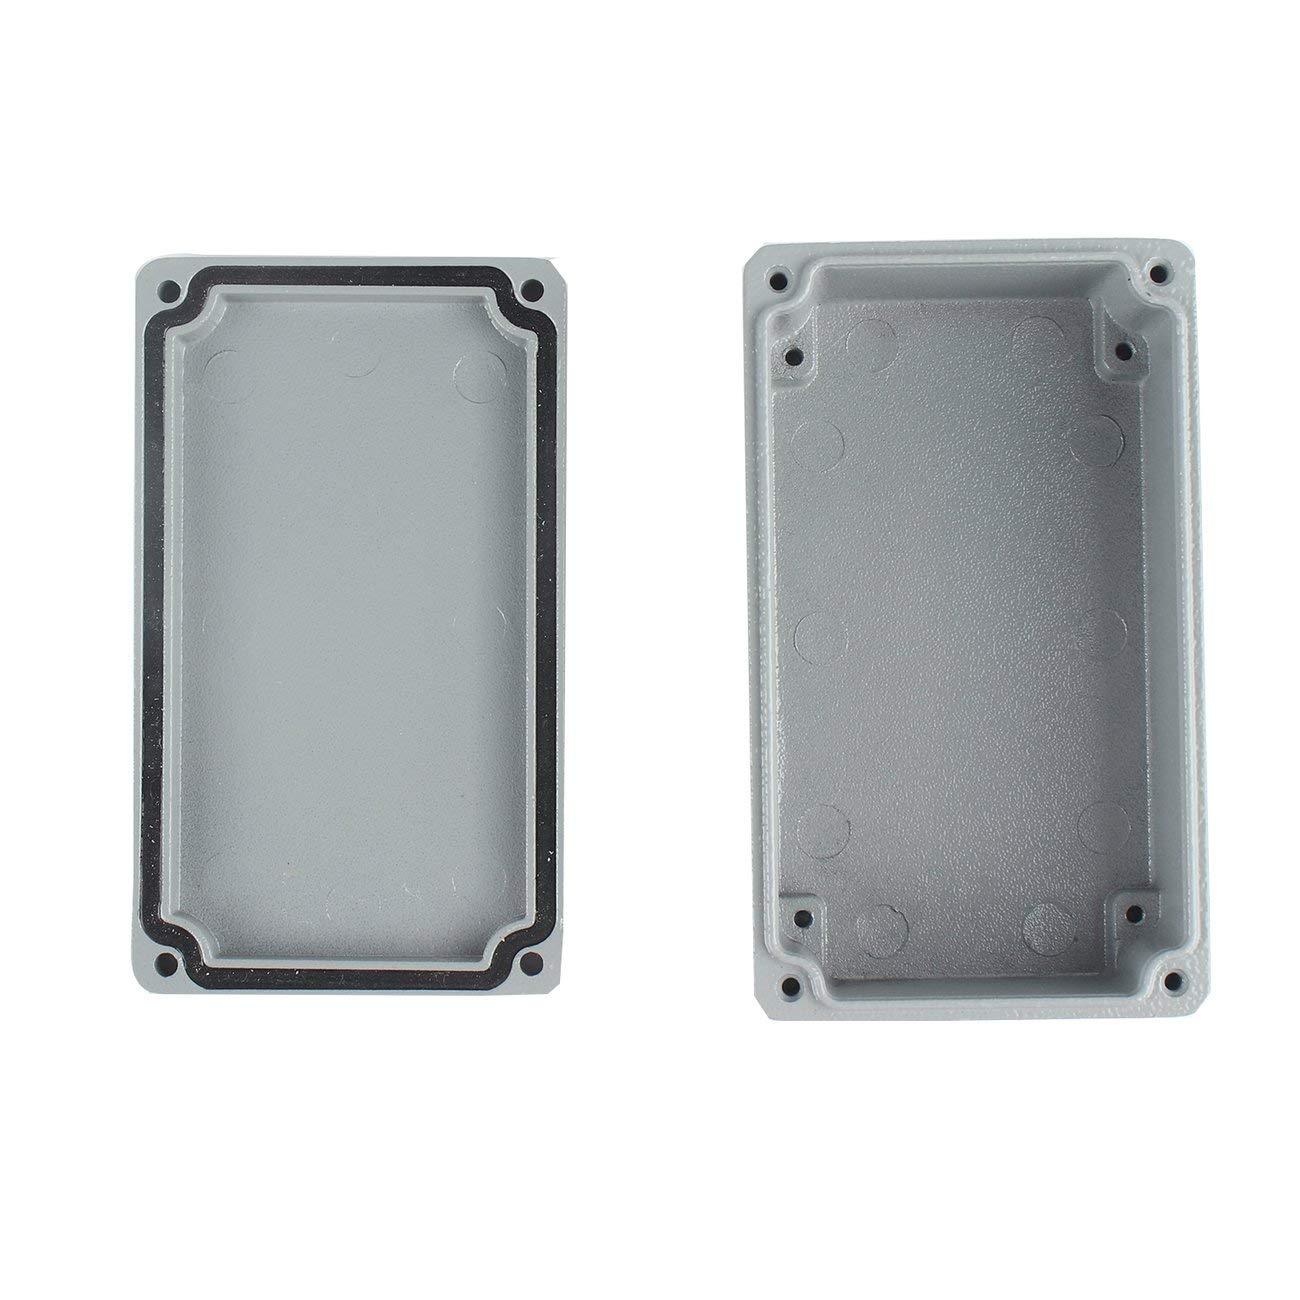 Caja a prueba de agua de aluminio fundido a presi/ón Caja de conexiones de pl/ástico a prueba de agua IP66 Caja de caja de instrumentos electr/ónicos Caja 125X80X60mm Blanco